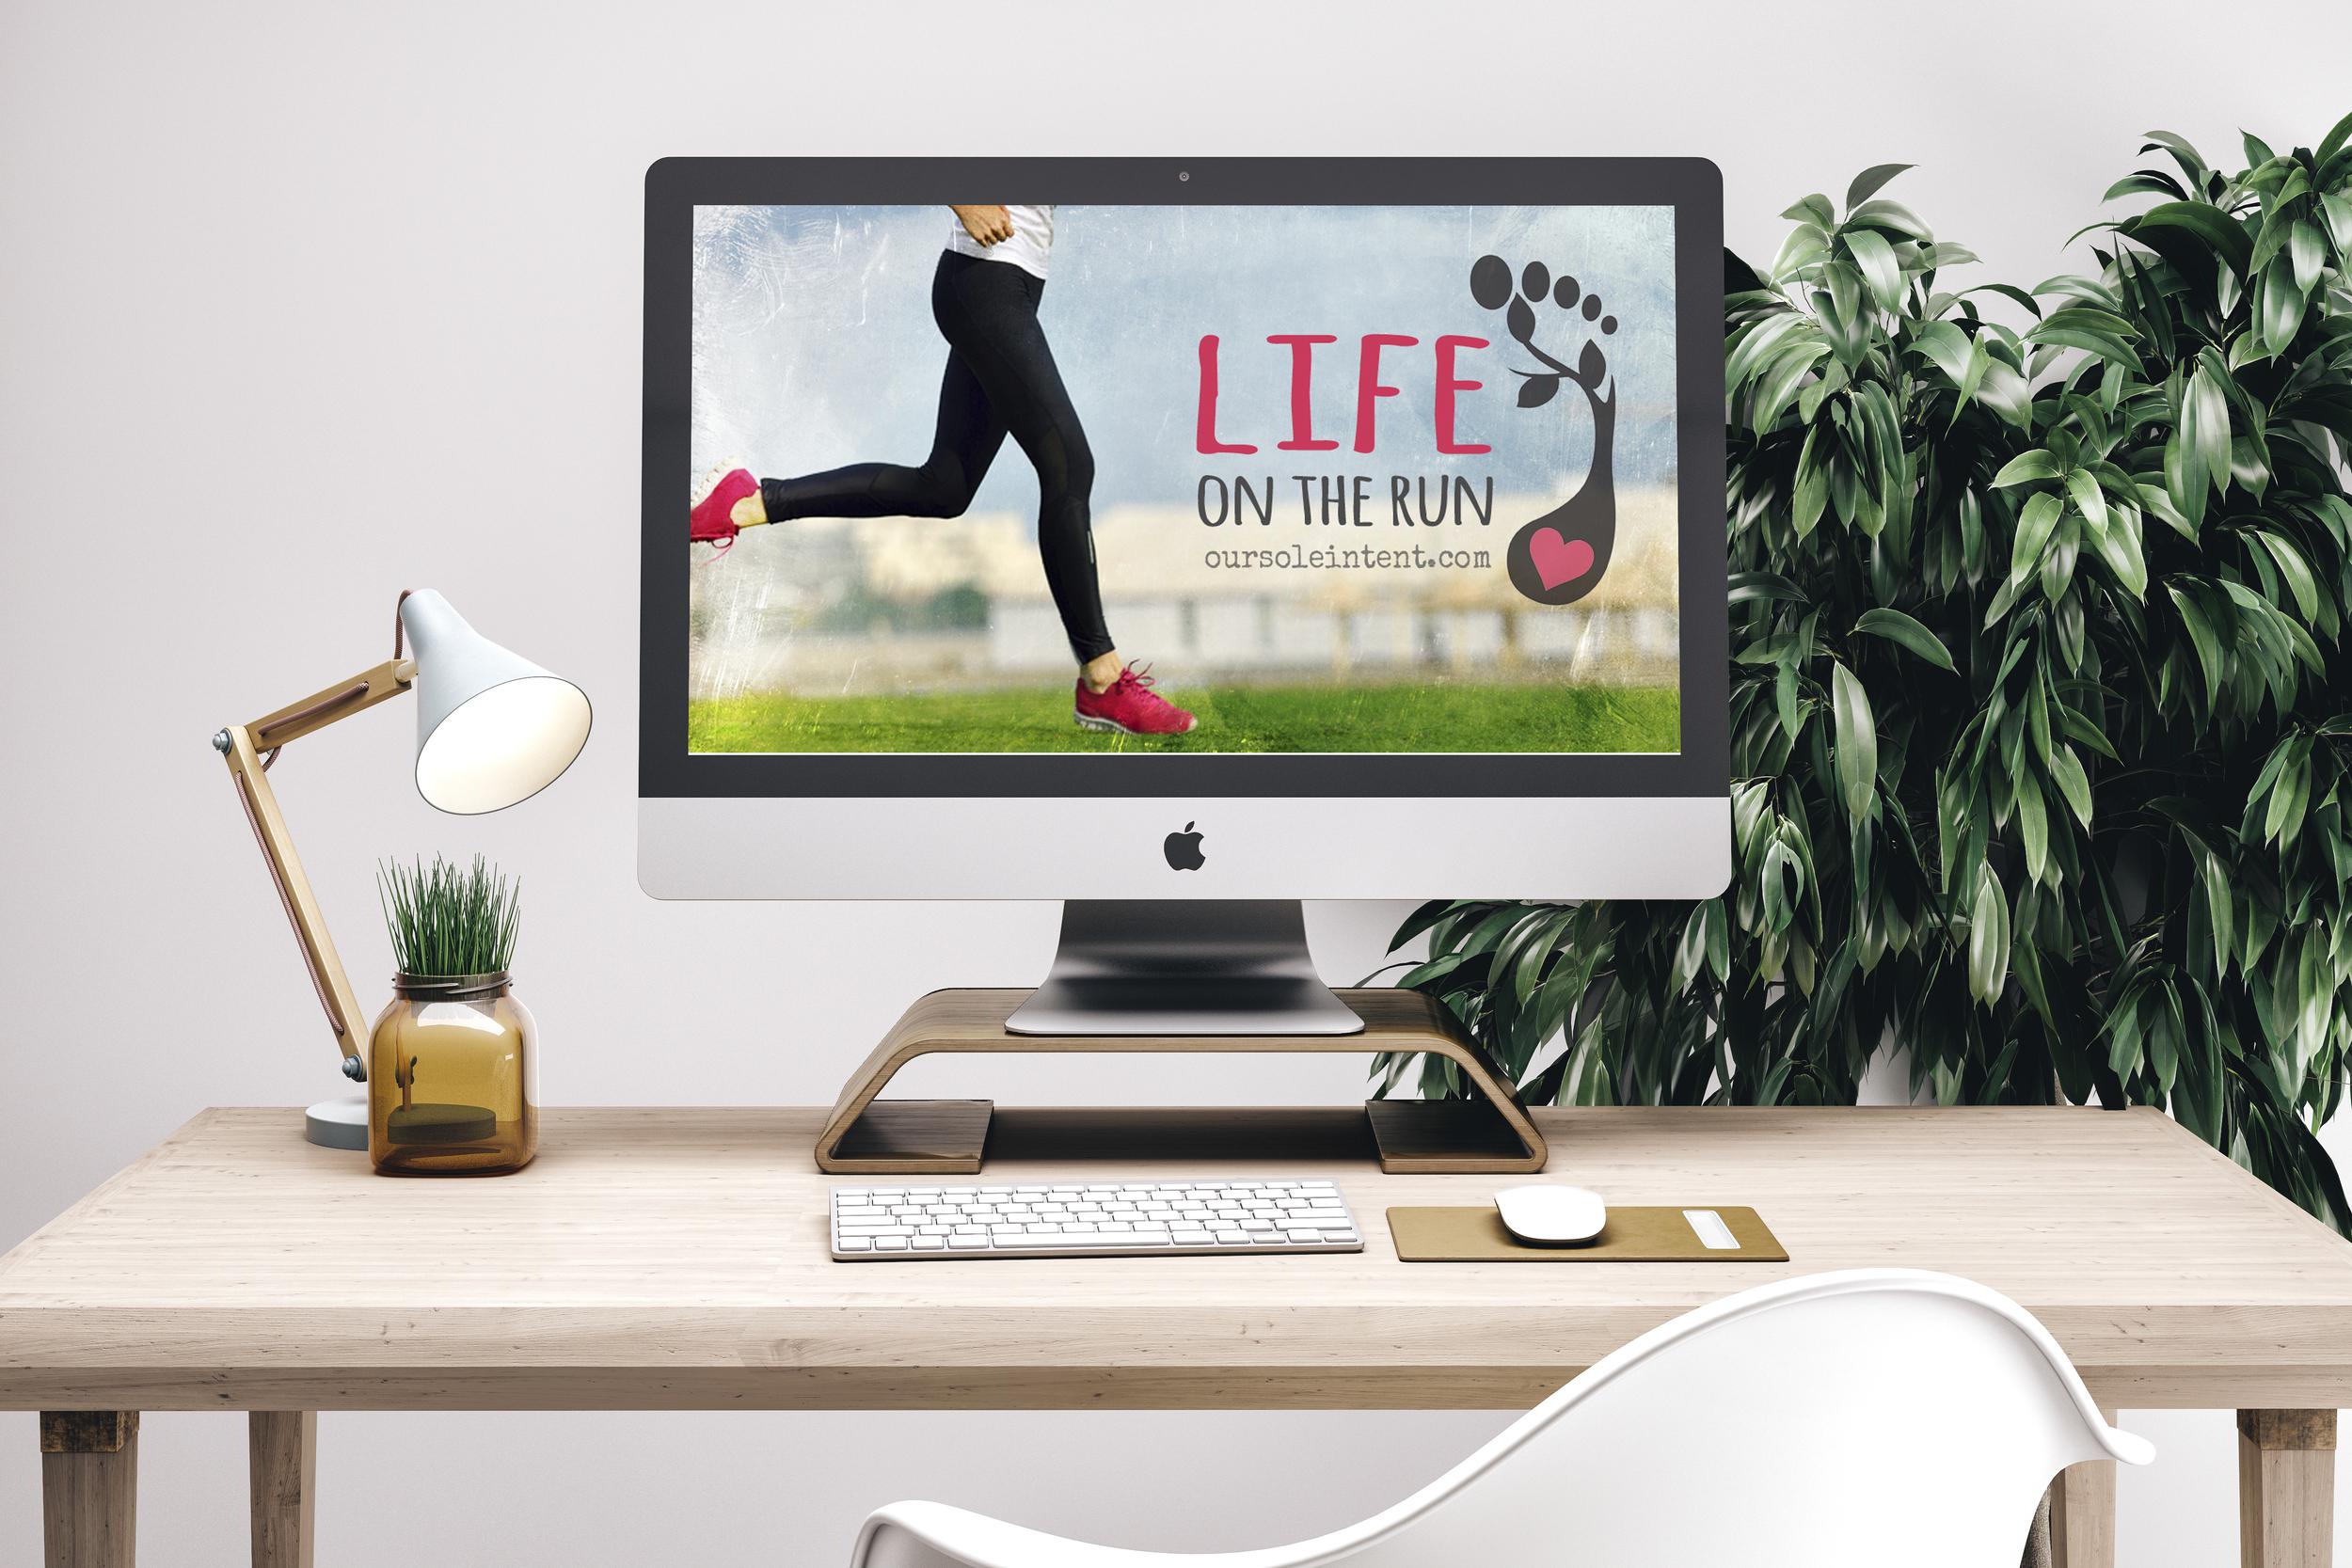 life on the run webinar.jpg